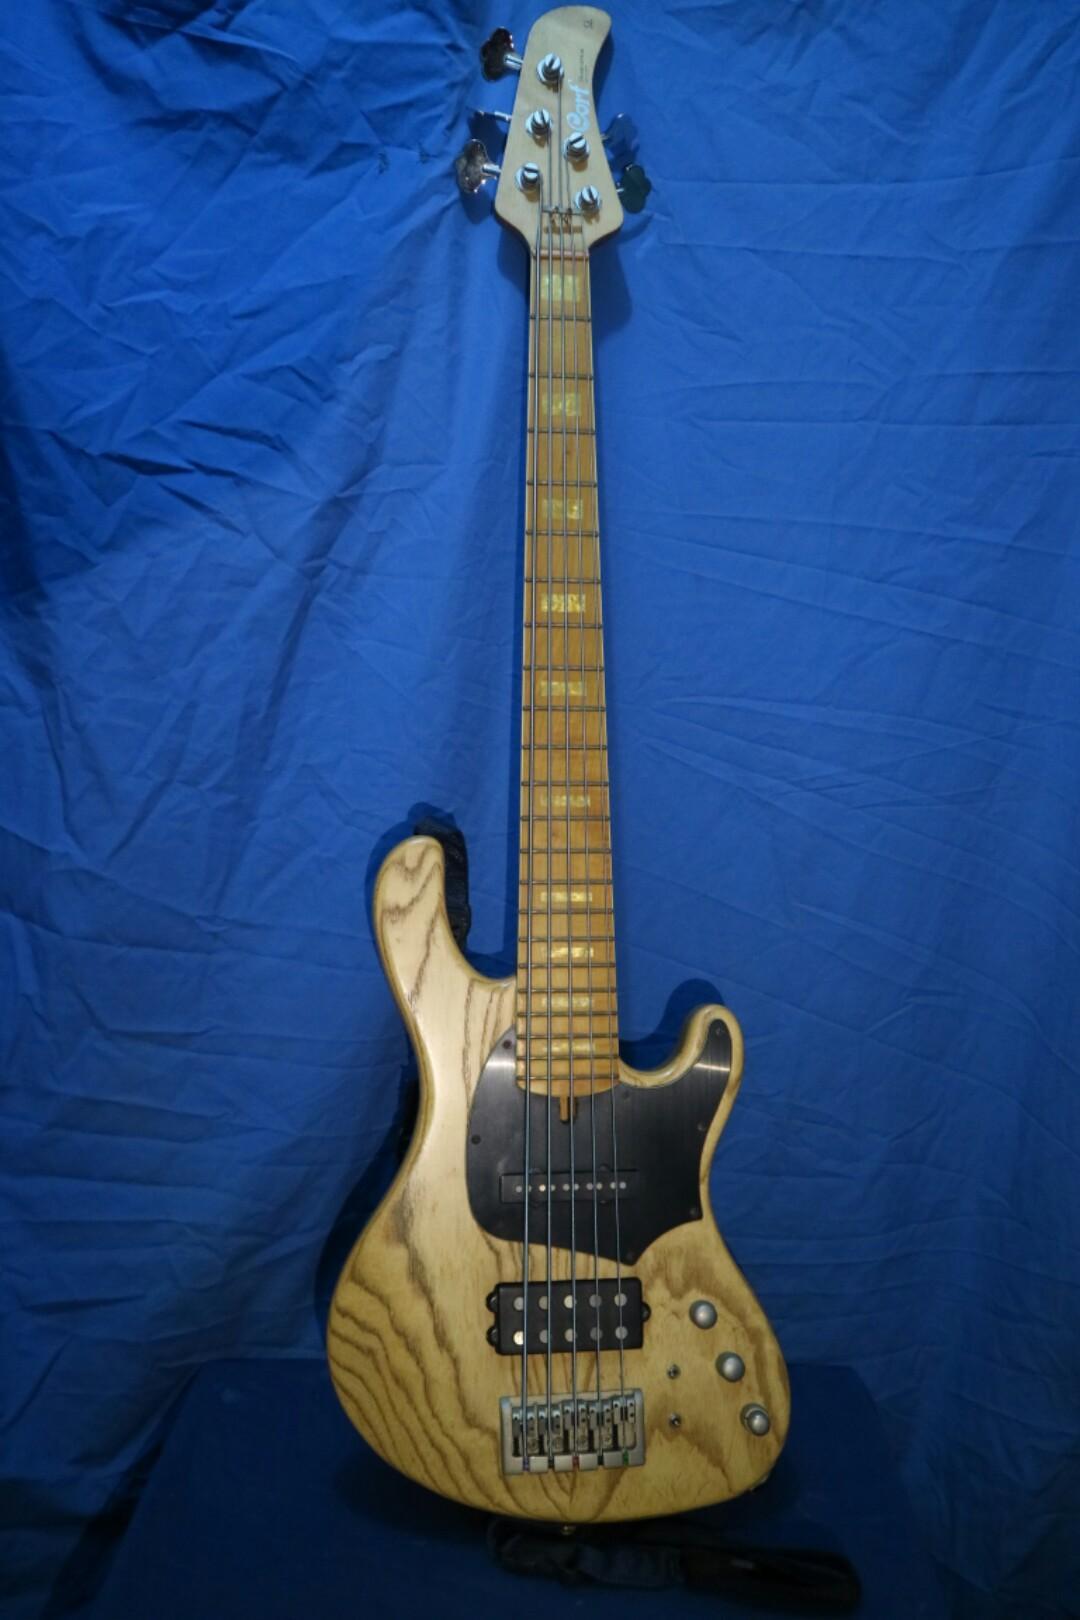 Bass Cord gb 75 not Fender g&l tribute jazz bass sequier musicman